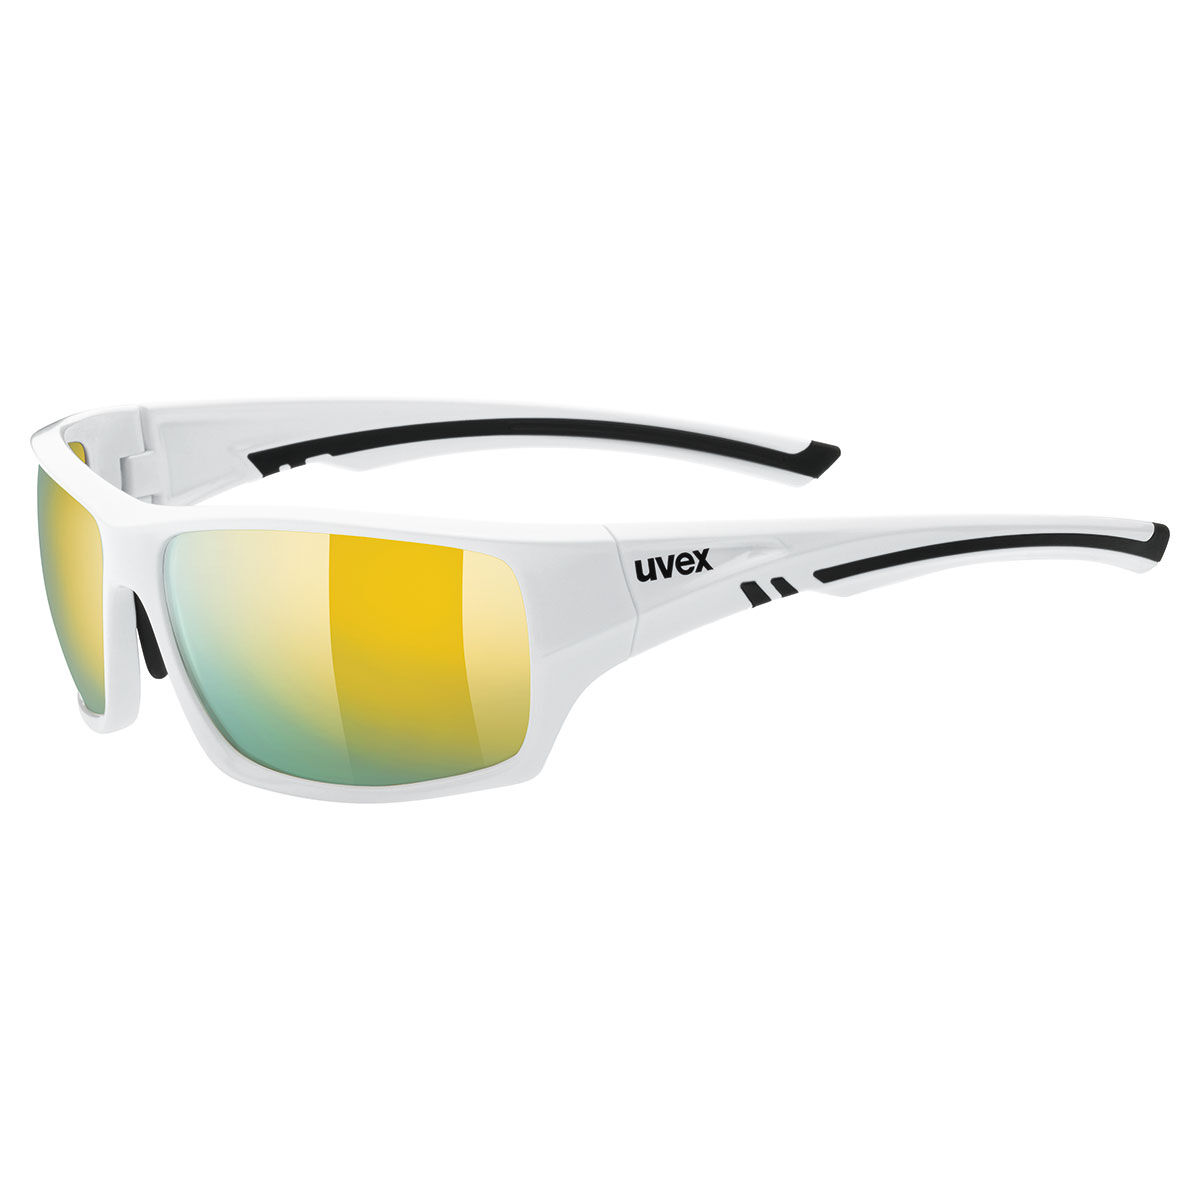 Lunettes de soleil UVEX SPORTSTYLE 222 Polarized White //. 9M1B60pMrF